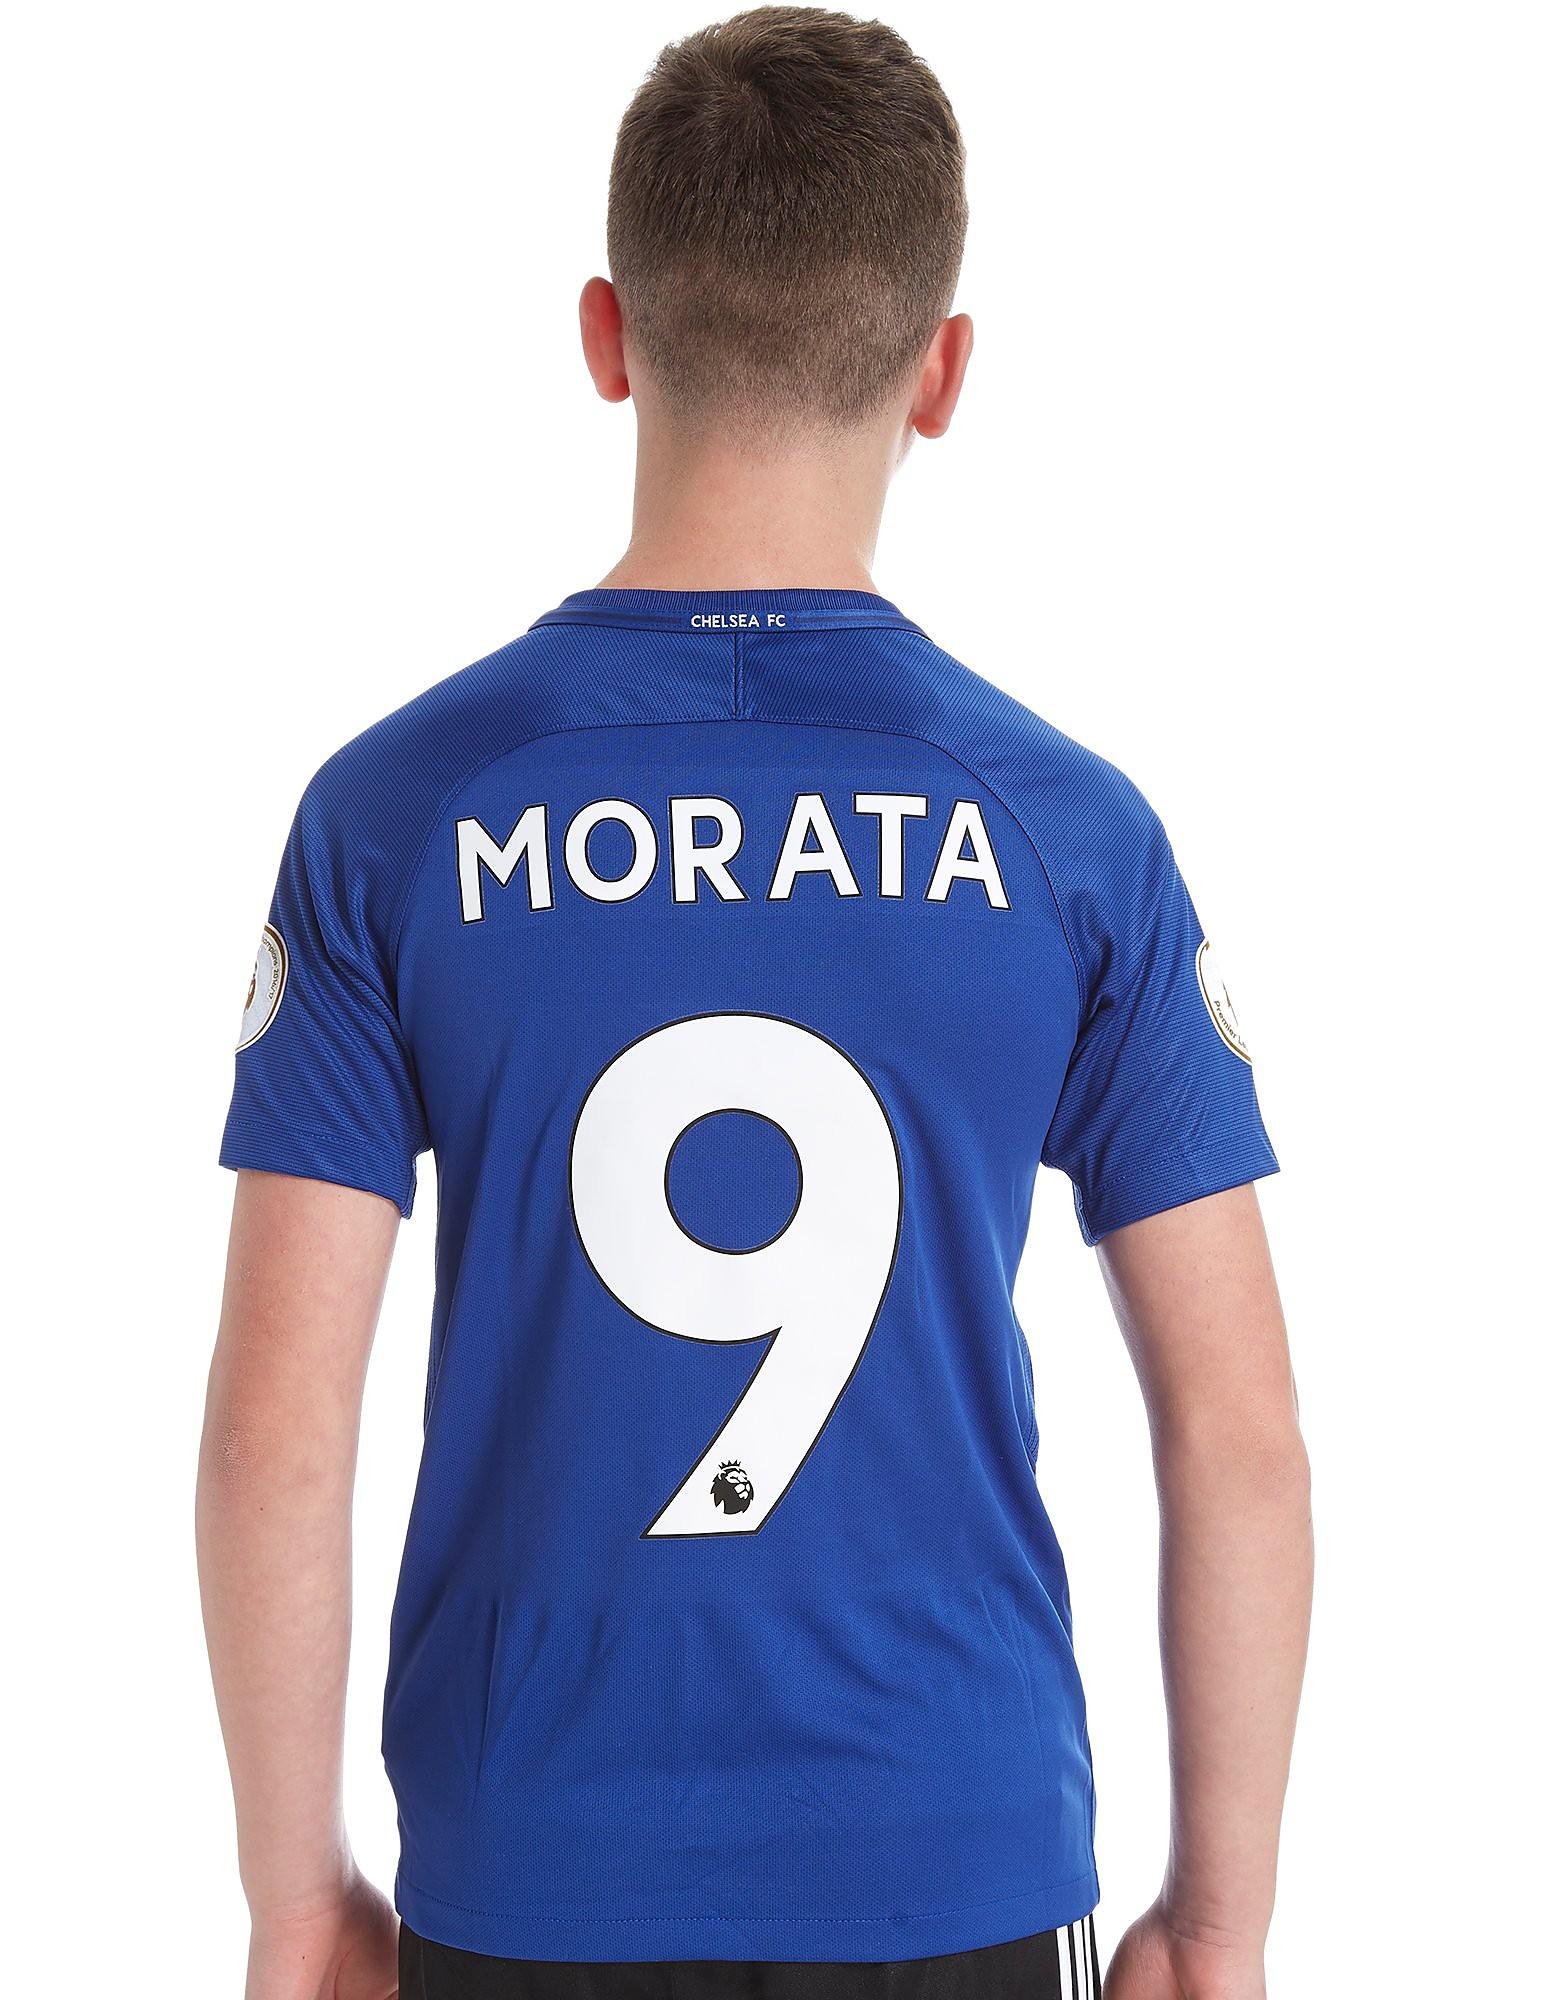 Nike Chelsea FC Home 2017/18 Morata #9 Shirt Junior